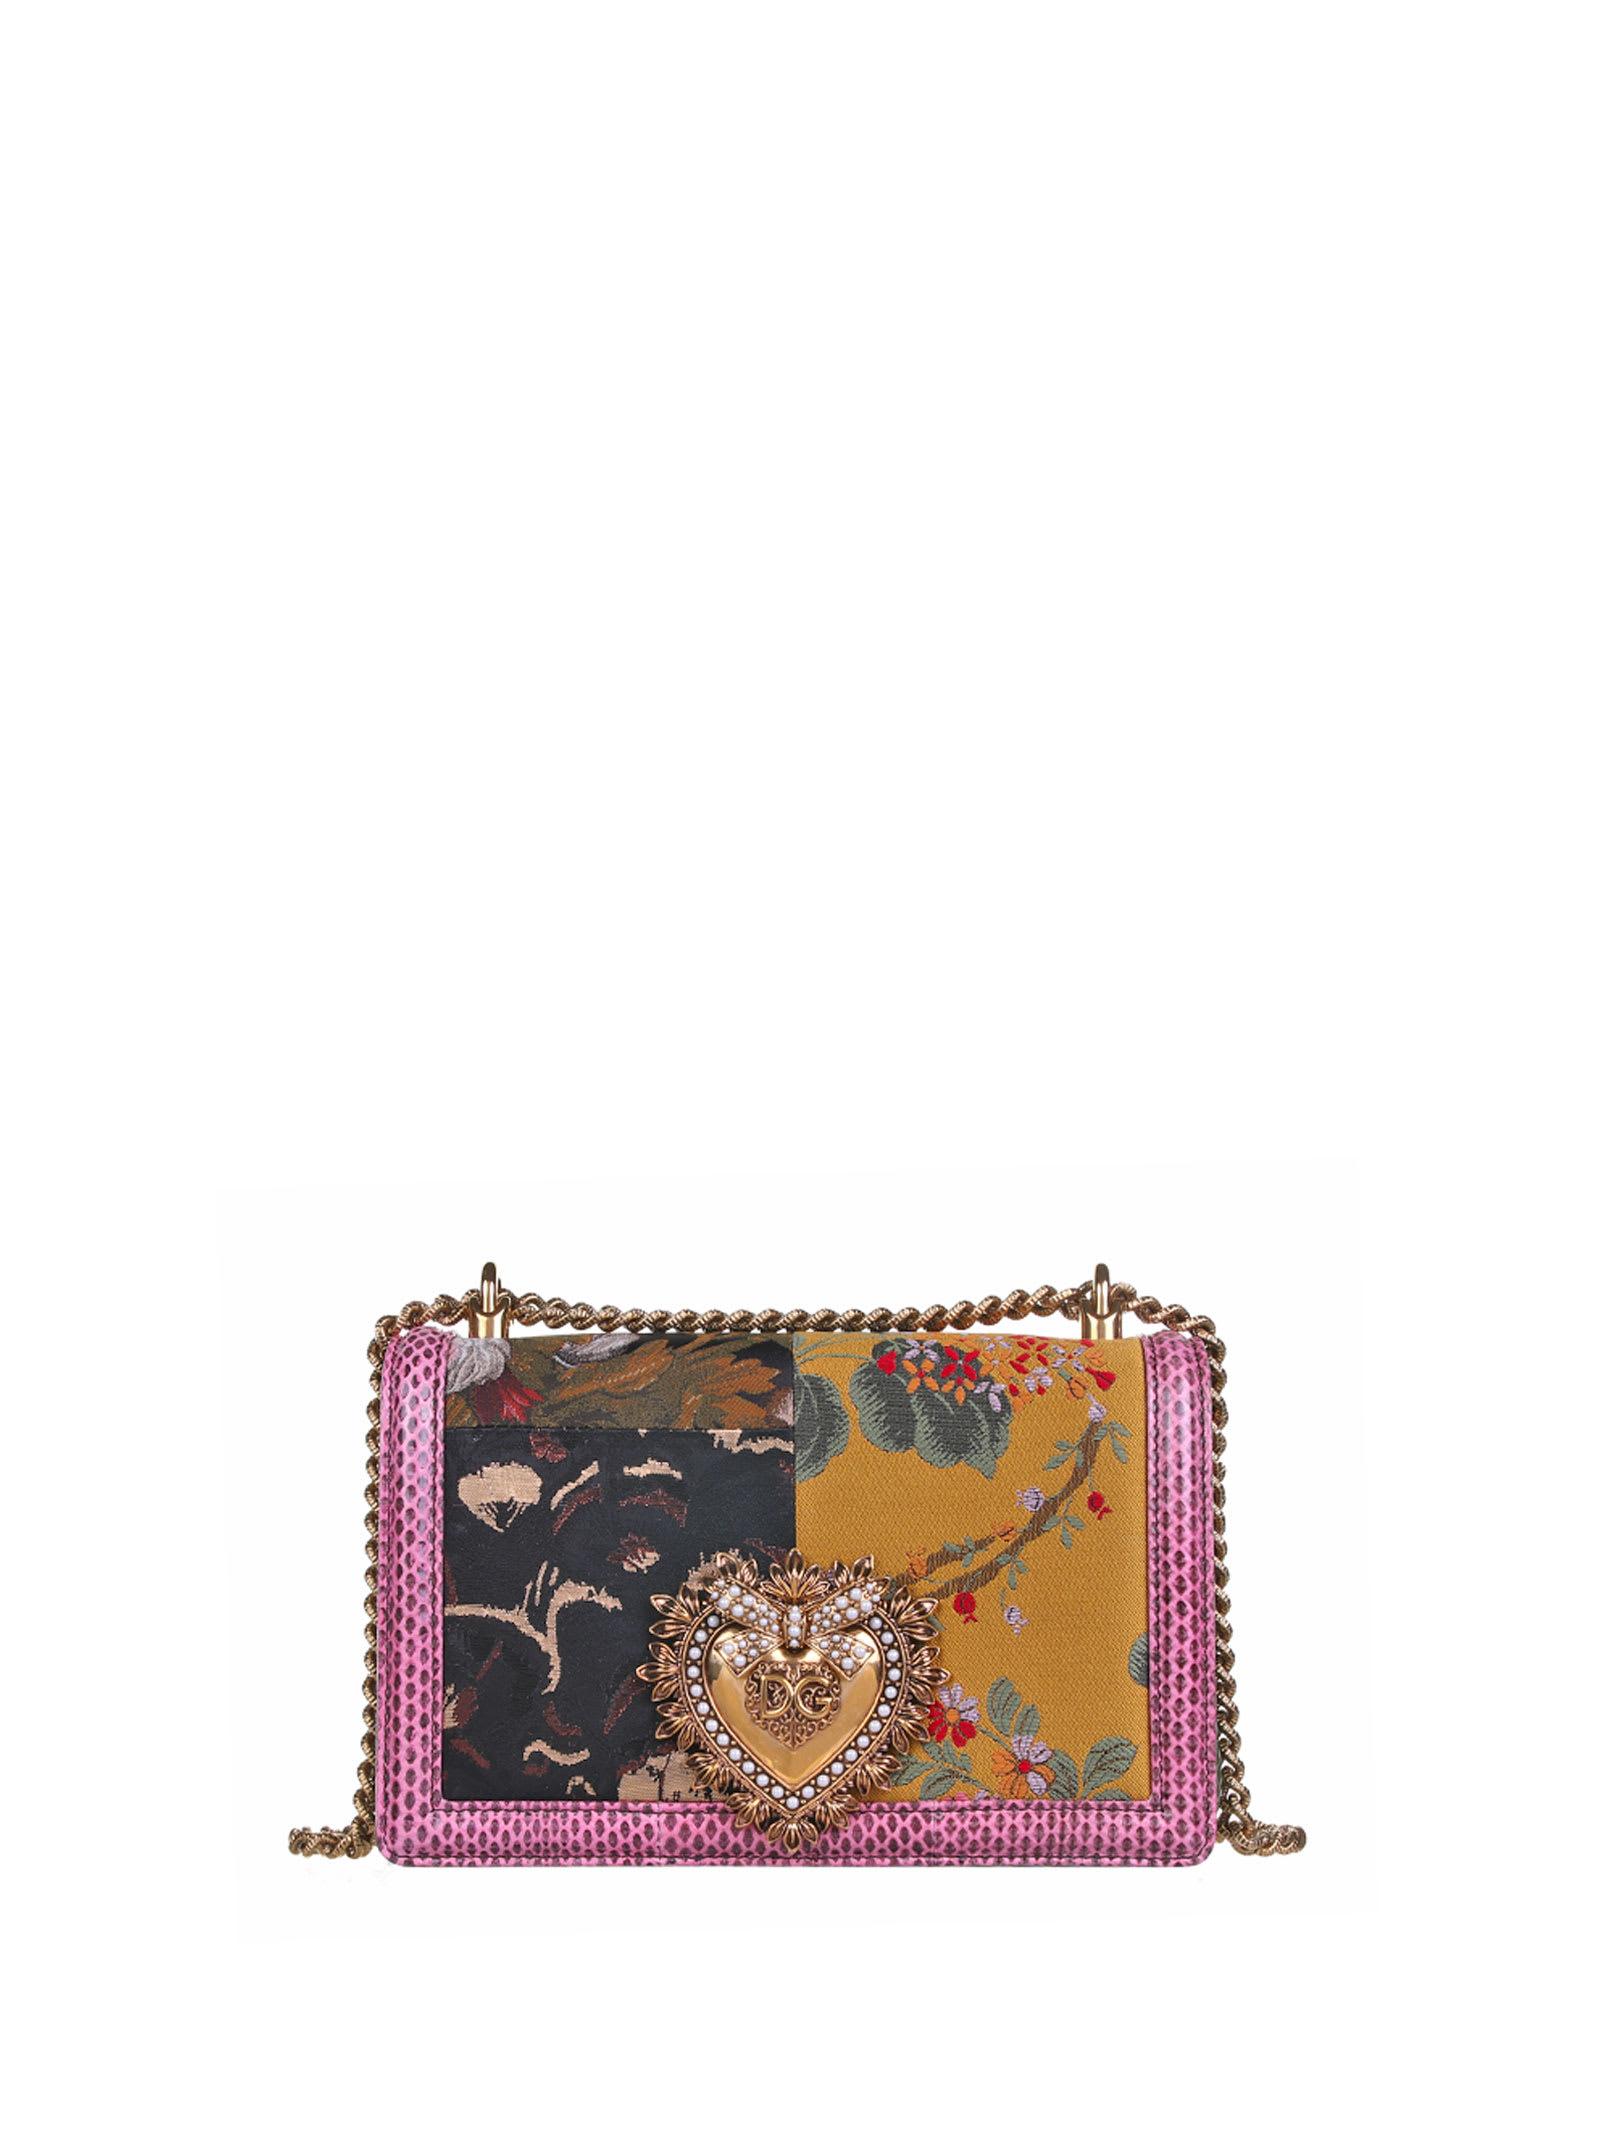 Dolce & Gabbana Leathers DEVOTION BAG